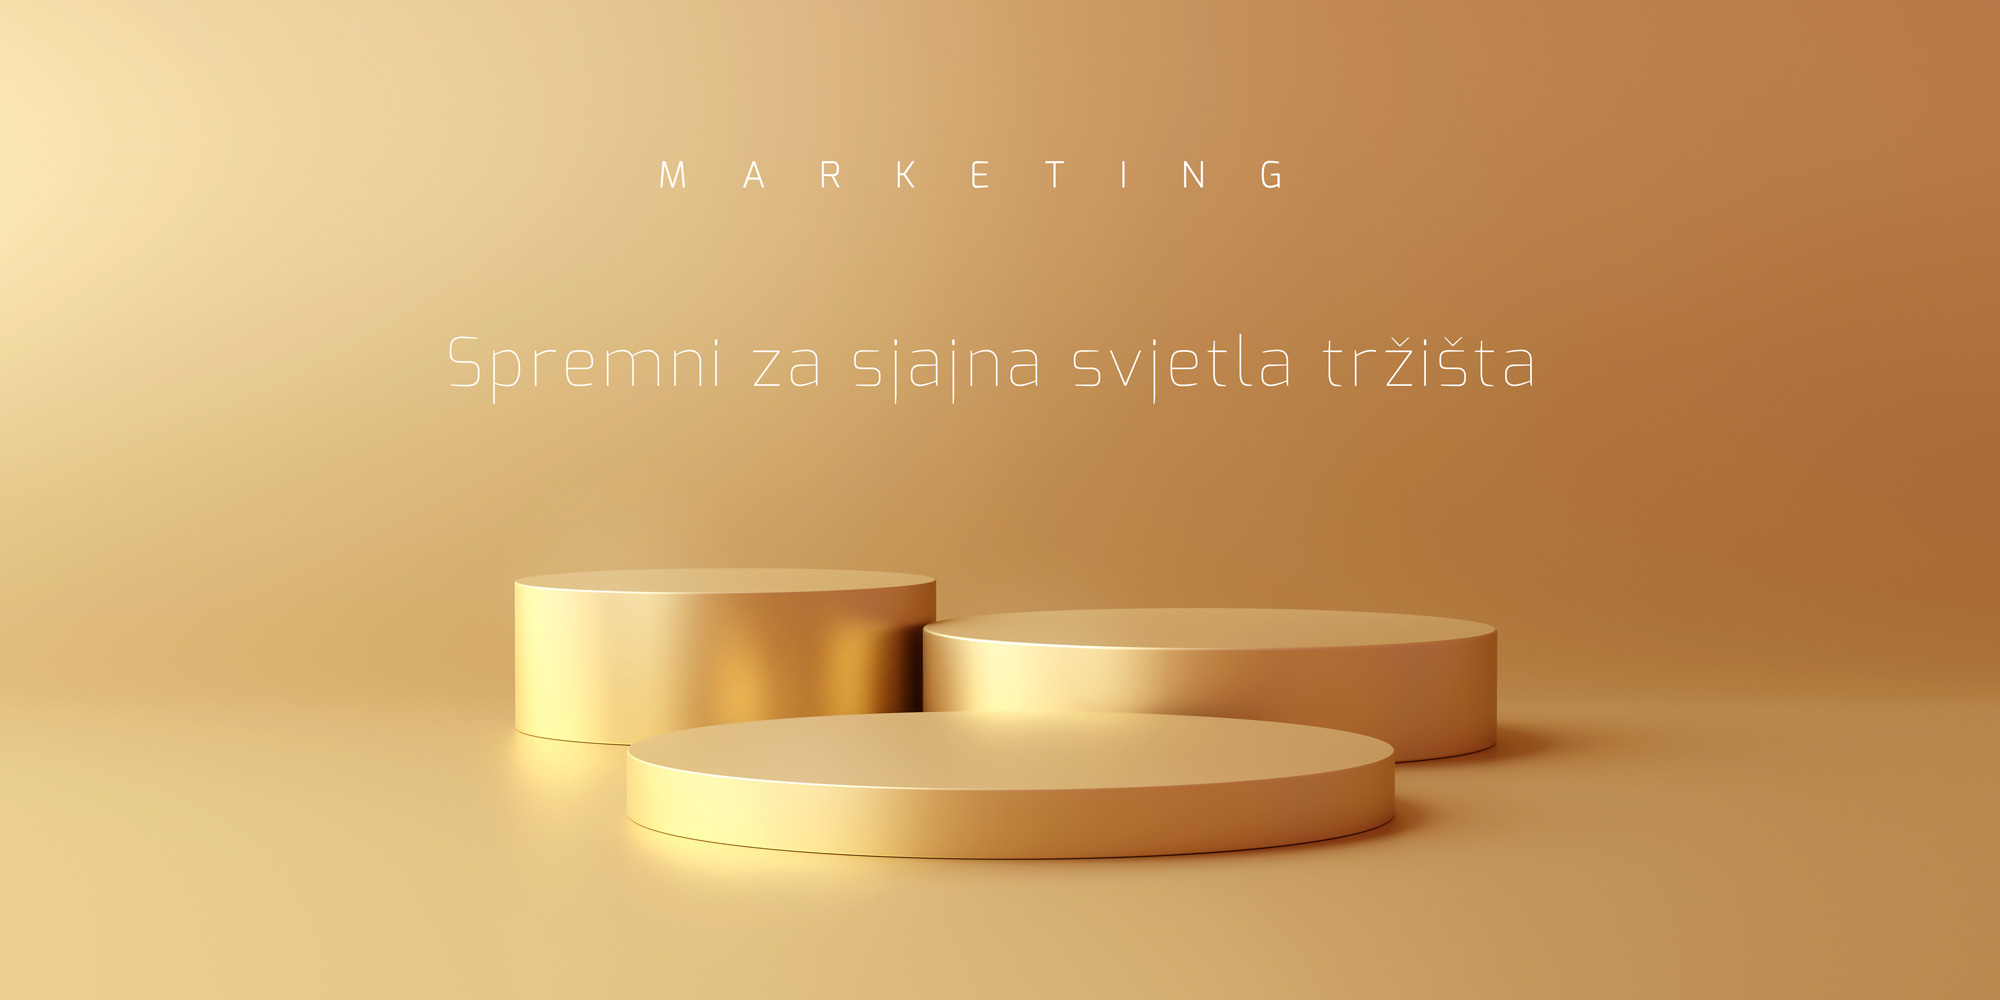 _Izrada_logotipa_Web-dizajn_Slavonski-Brod_Osijek_Grafički_Dizajn_Branding_marketing01